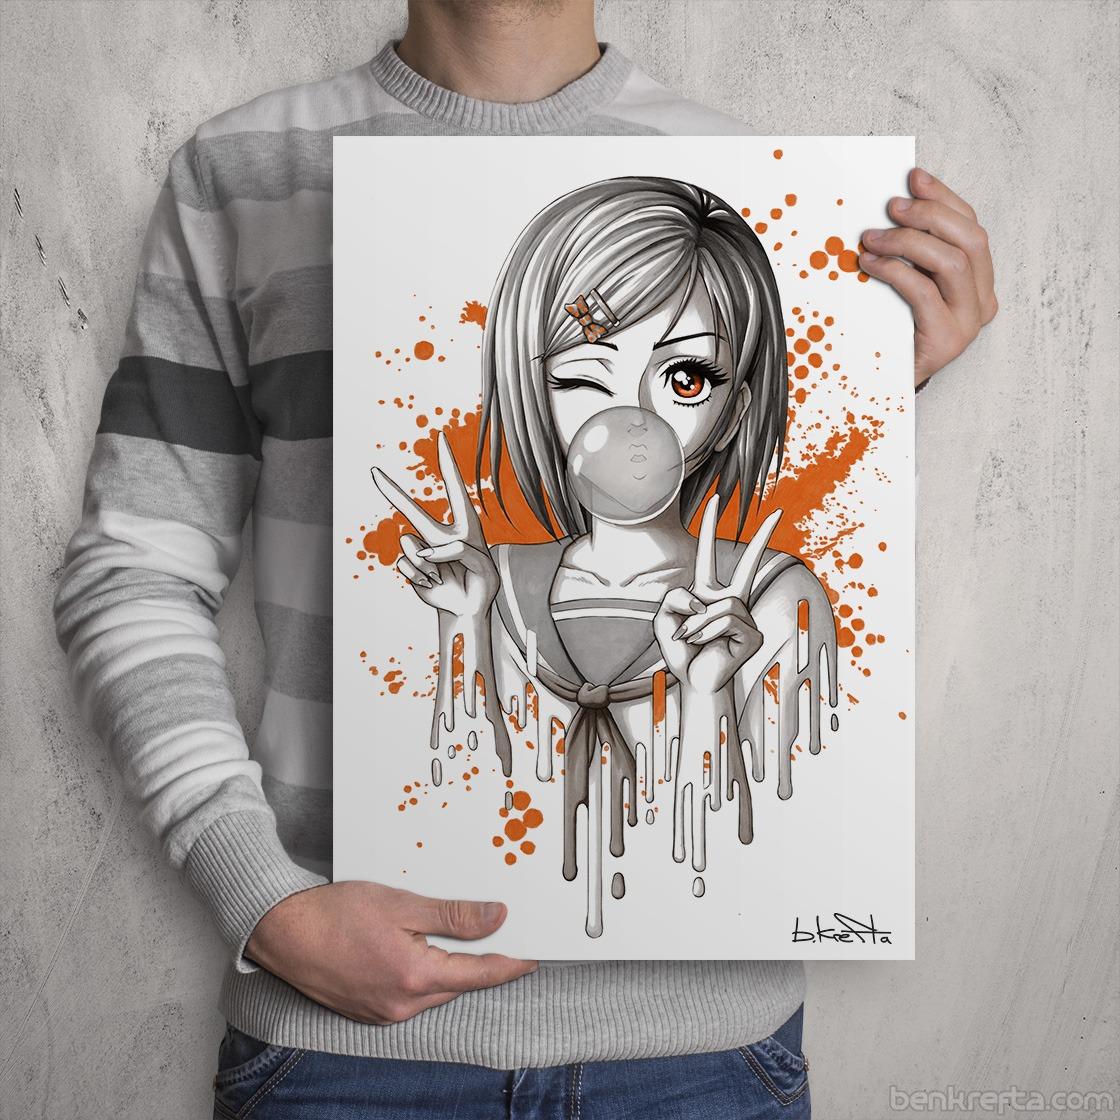 Ben Krefta Com A Bubblegum Manga Girl Print A A3 Neo